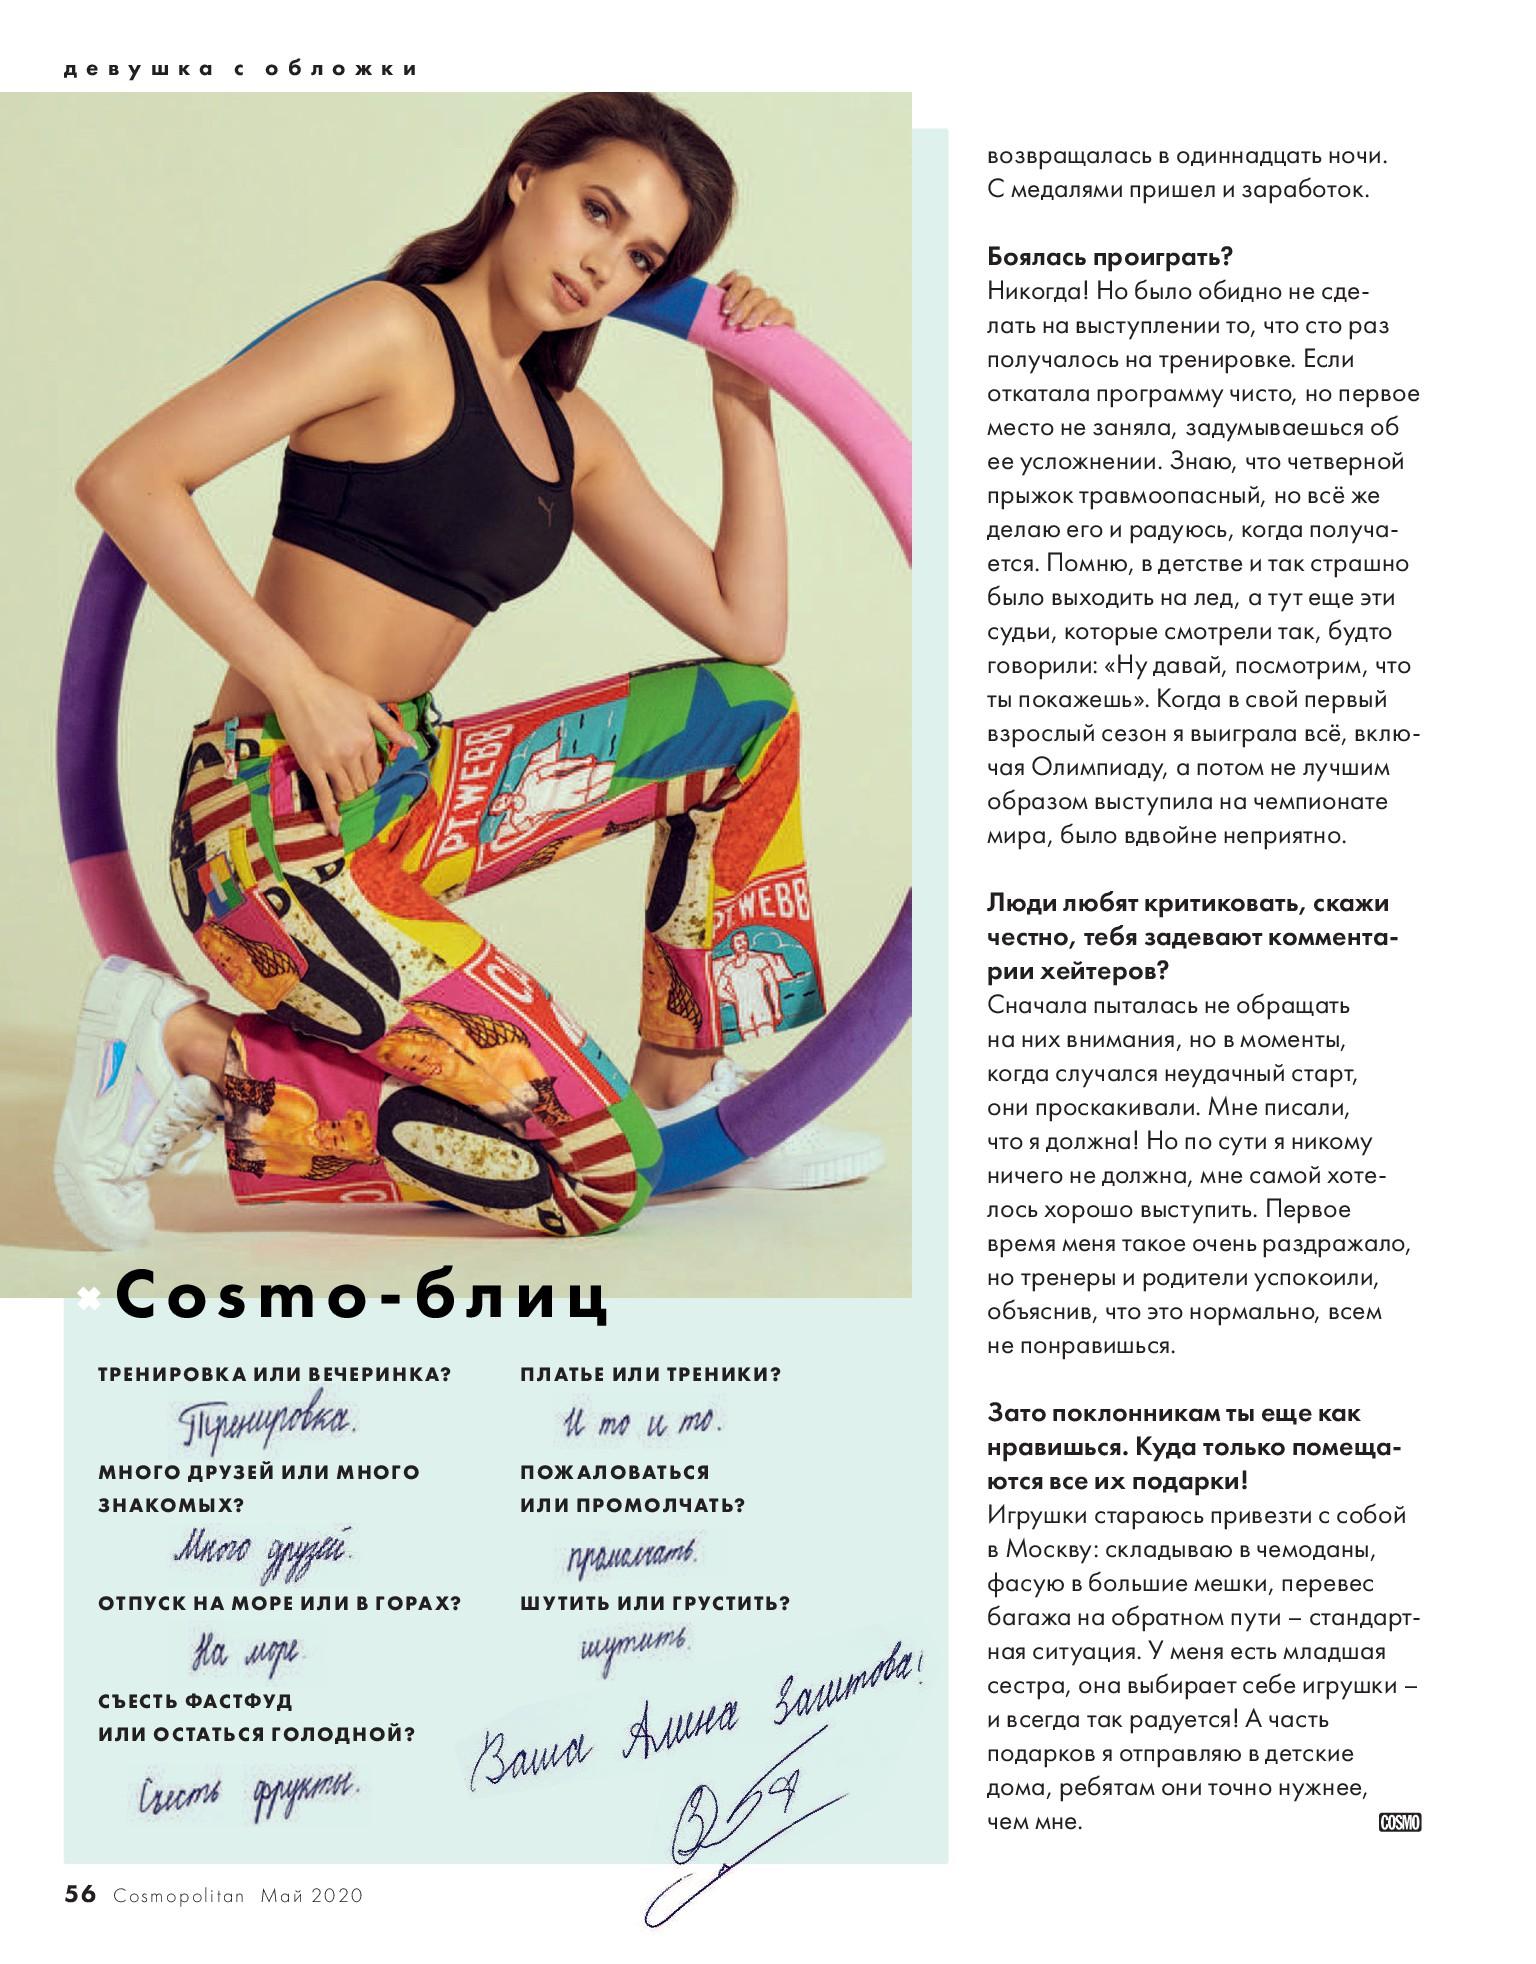 Алина Ильназовна Загитова-3 | Олимпийская чемпионка - Страница 6 2SFxnZBEW9Q